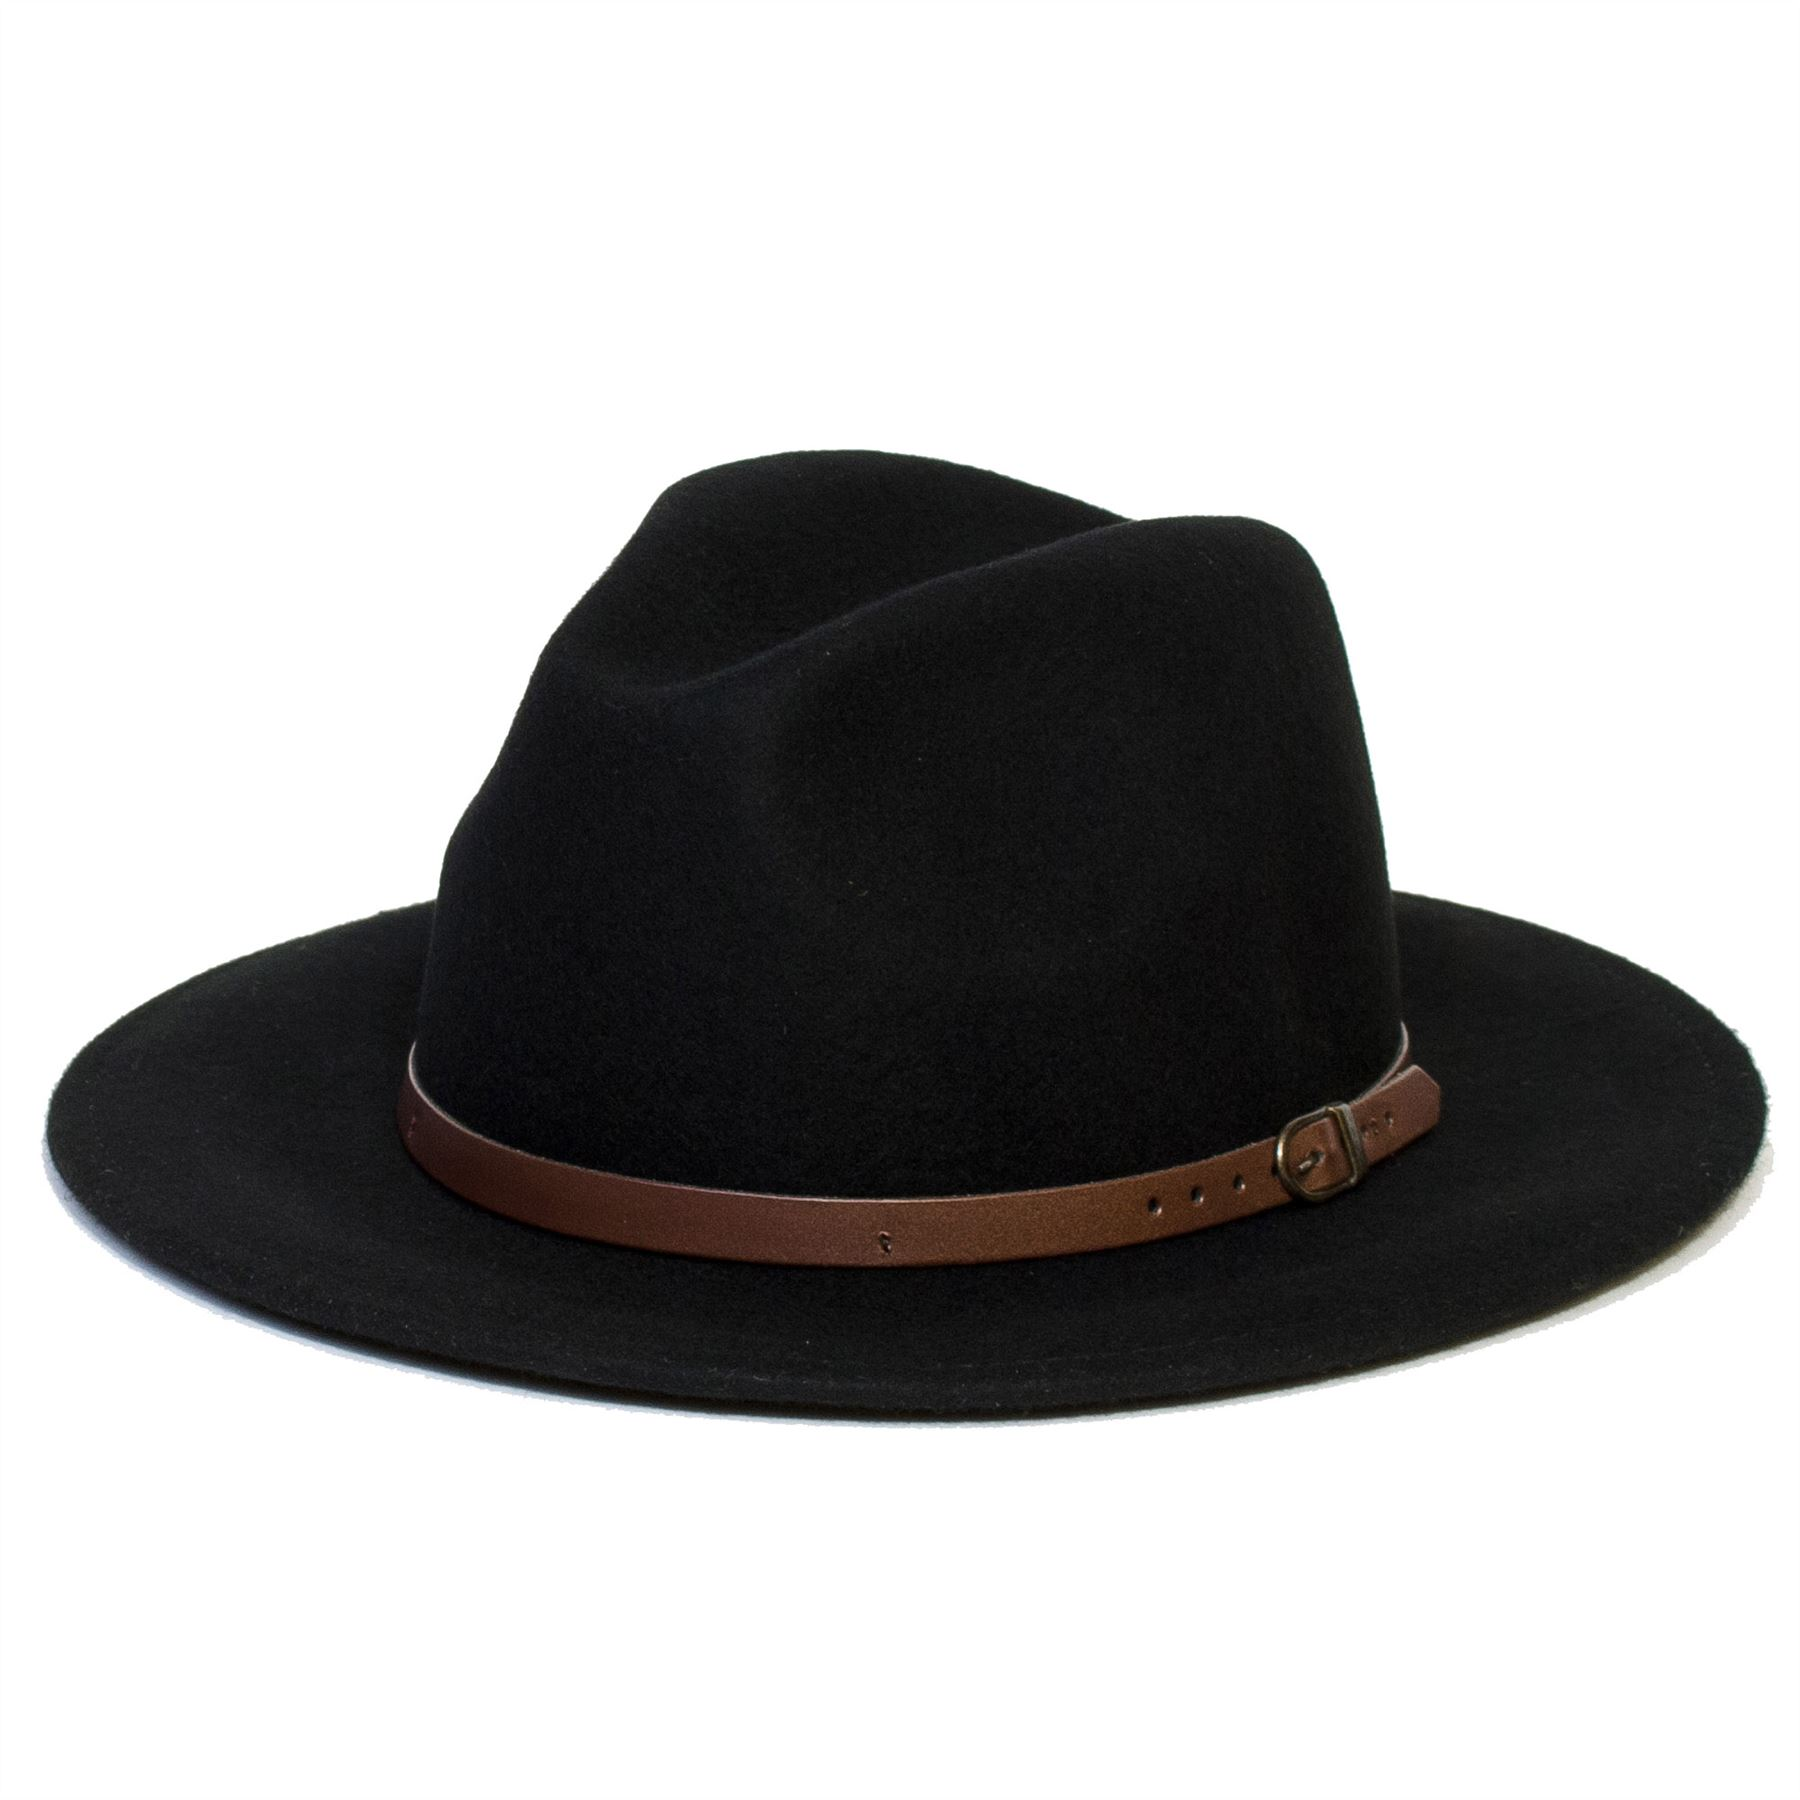 Mens Women Wool Vintage Felt Fedora Wide Brim Hat Cap New ...